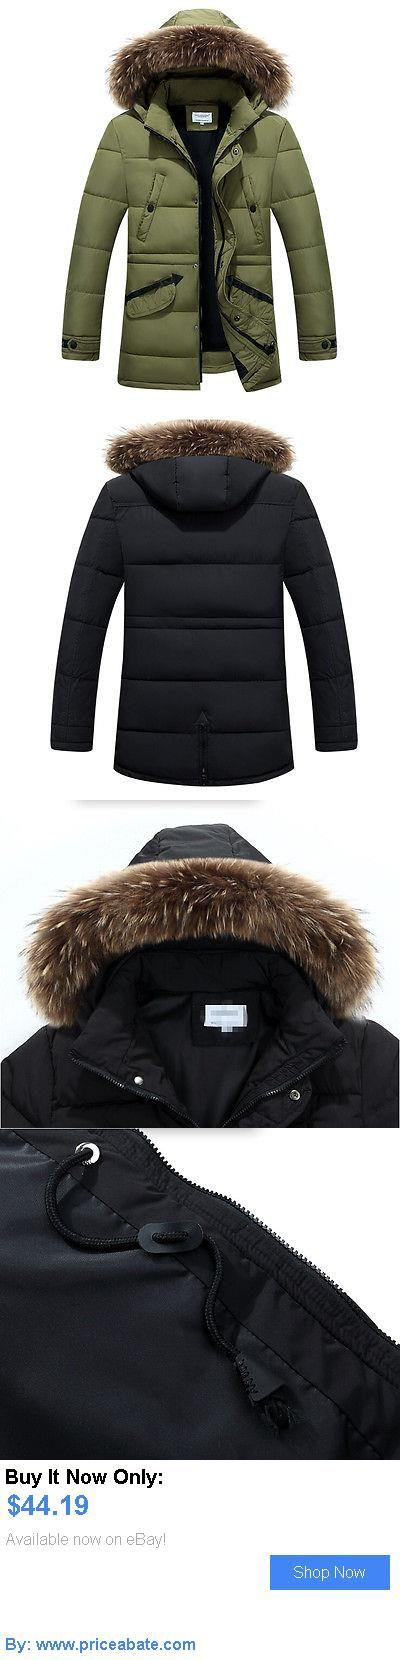 Men Coats And Jackets: Parka Mens Winter Thick Coat Windbreaker Fur Hooded Warm Down Jacket Overcoat BUY IT NOW ONLY: $44.19 #priceabateMenCoatsAndJackets OR #priceabate